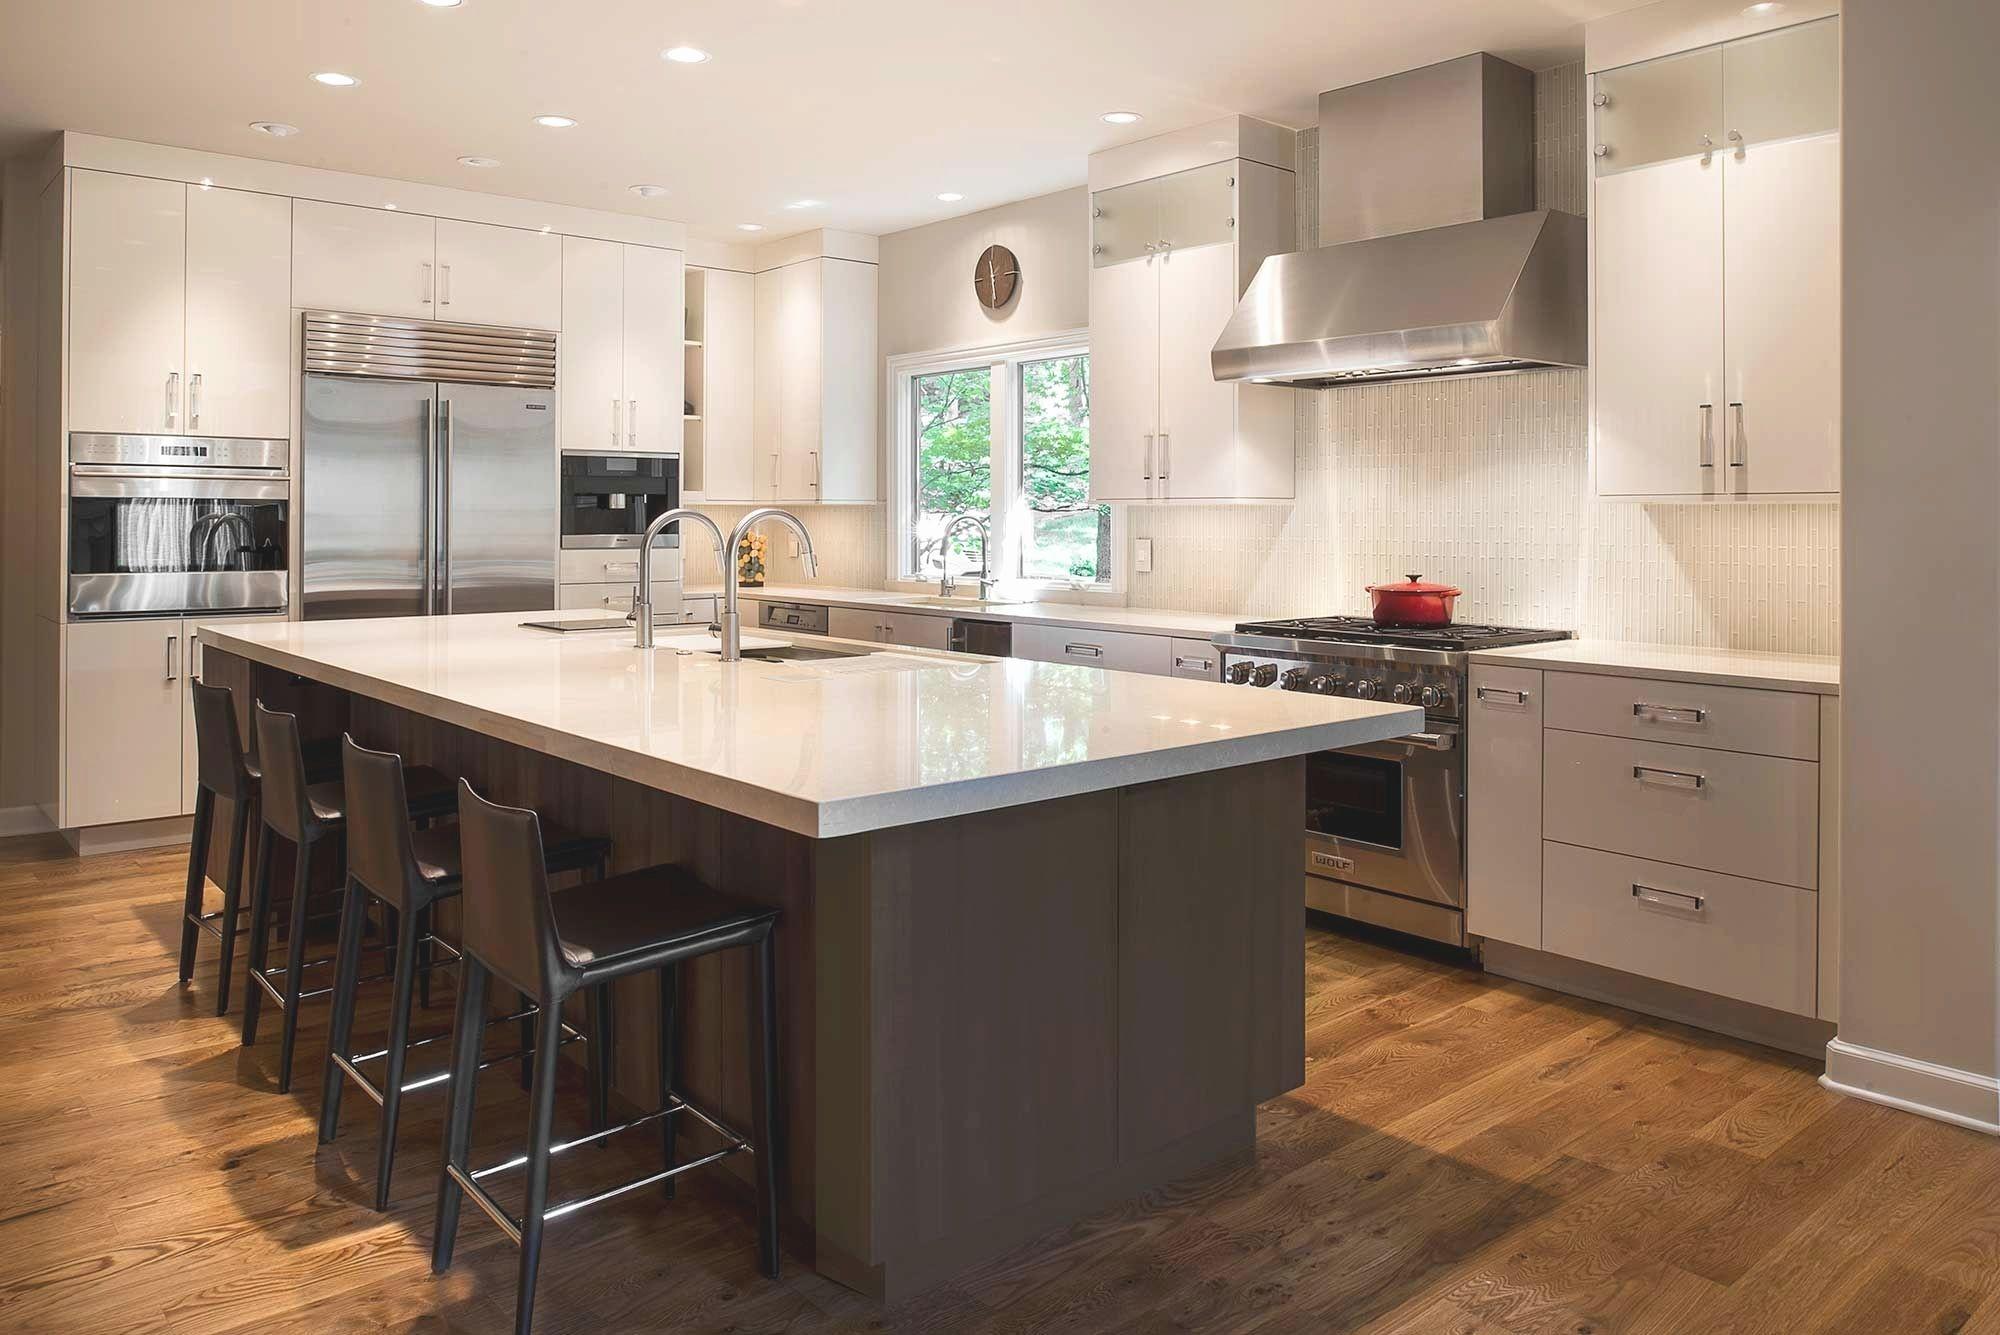 Kitchen Ideas Tulsa Kitchen Recover Home Within Kitchen Ideas Tulsa Kitchen Remodel Design Kitchen Kitchen Concepts